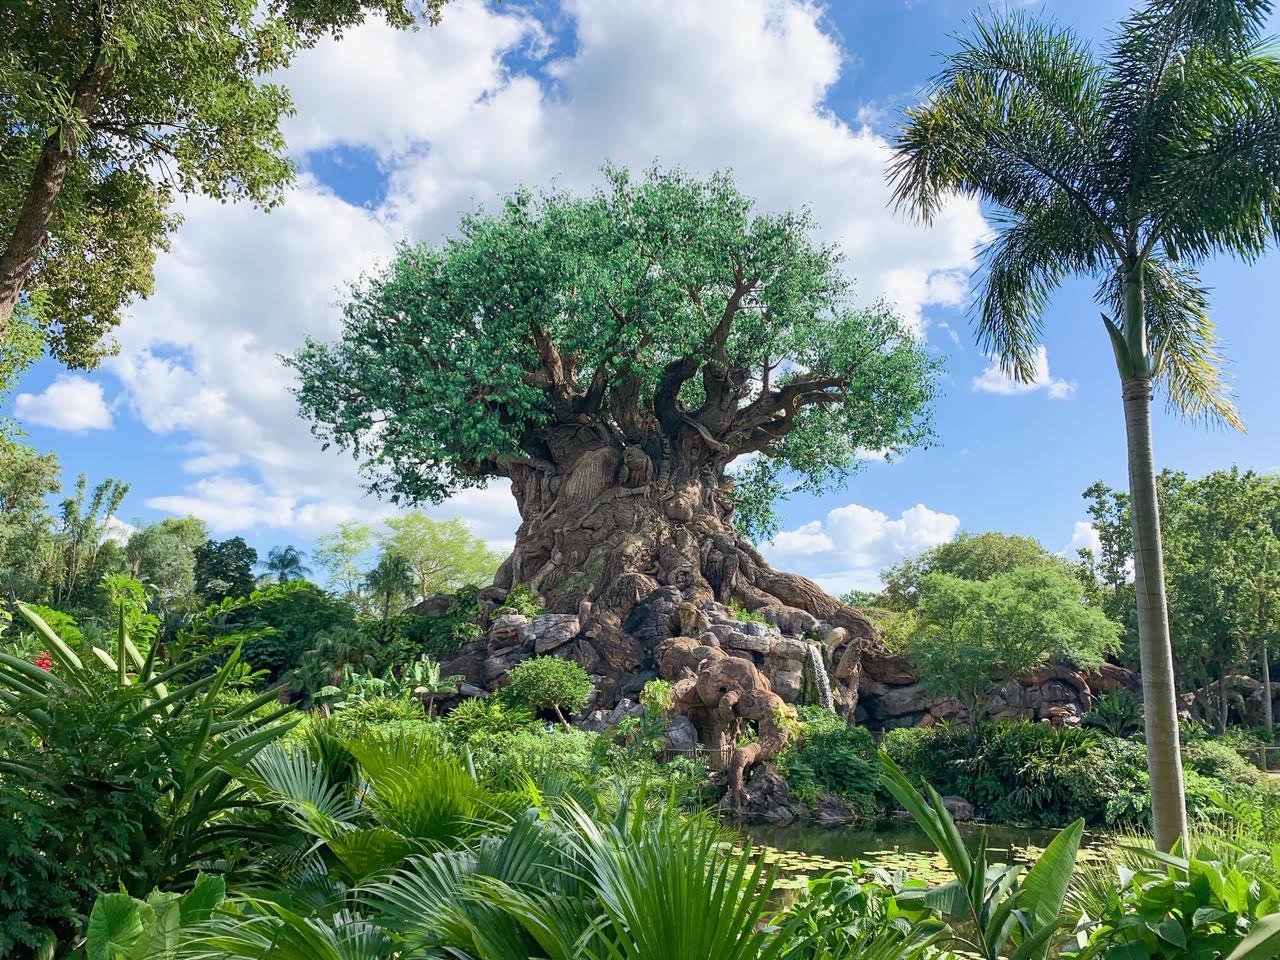 Disney on a Budget Animal Kingdom Tree of Life